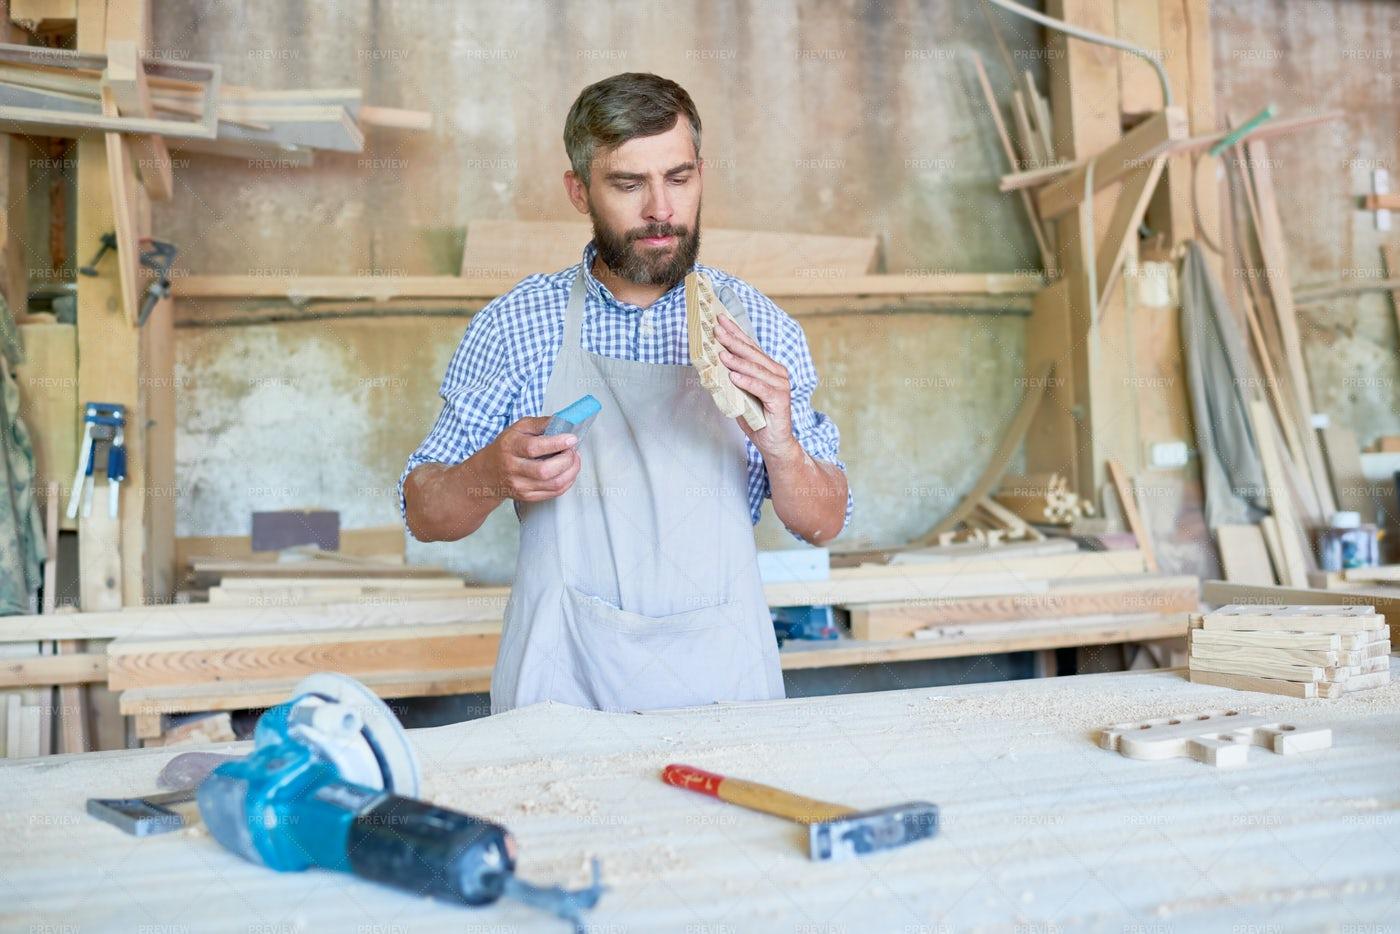 Skilled Carpenter Sanding Wooden...: Stock Photos